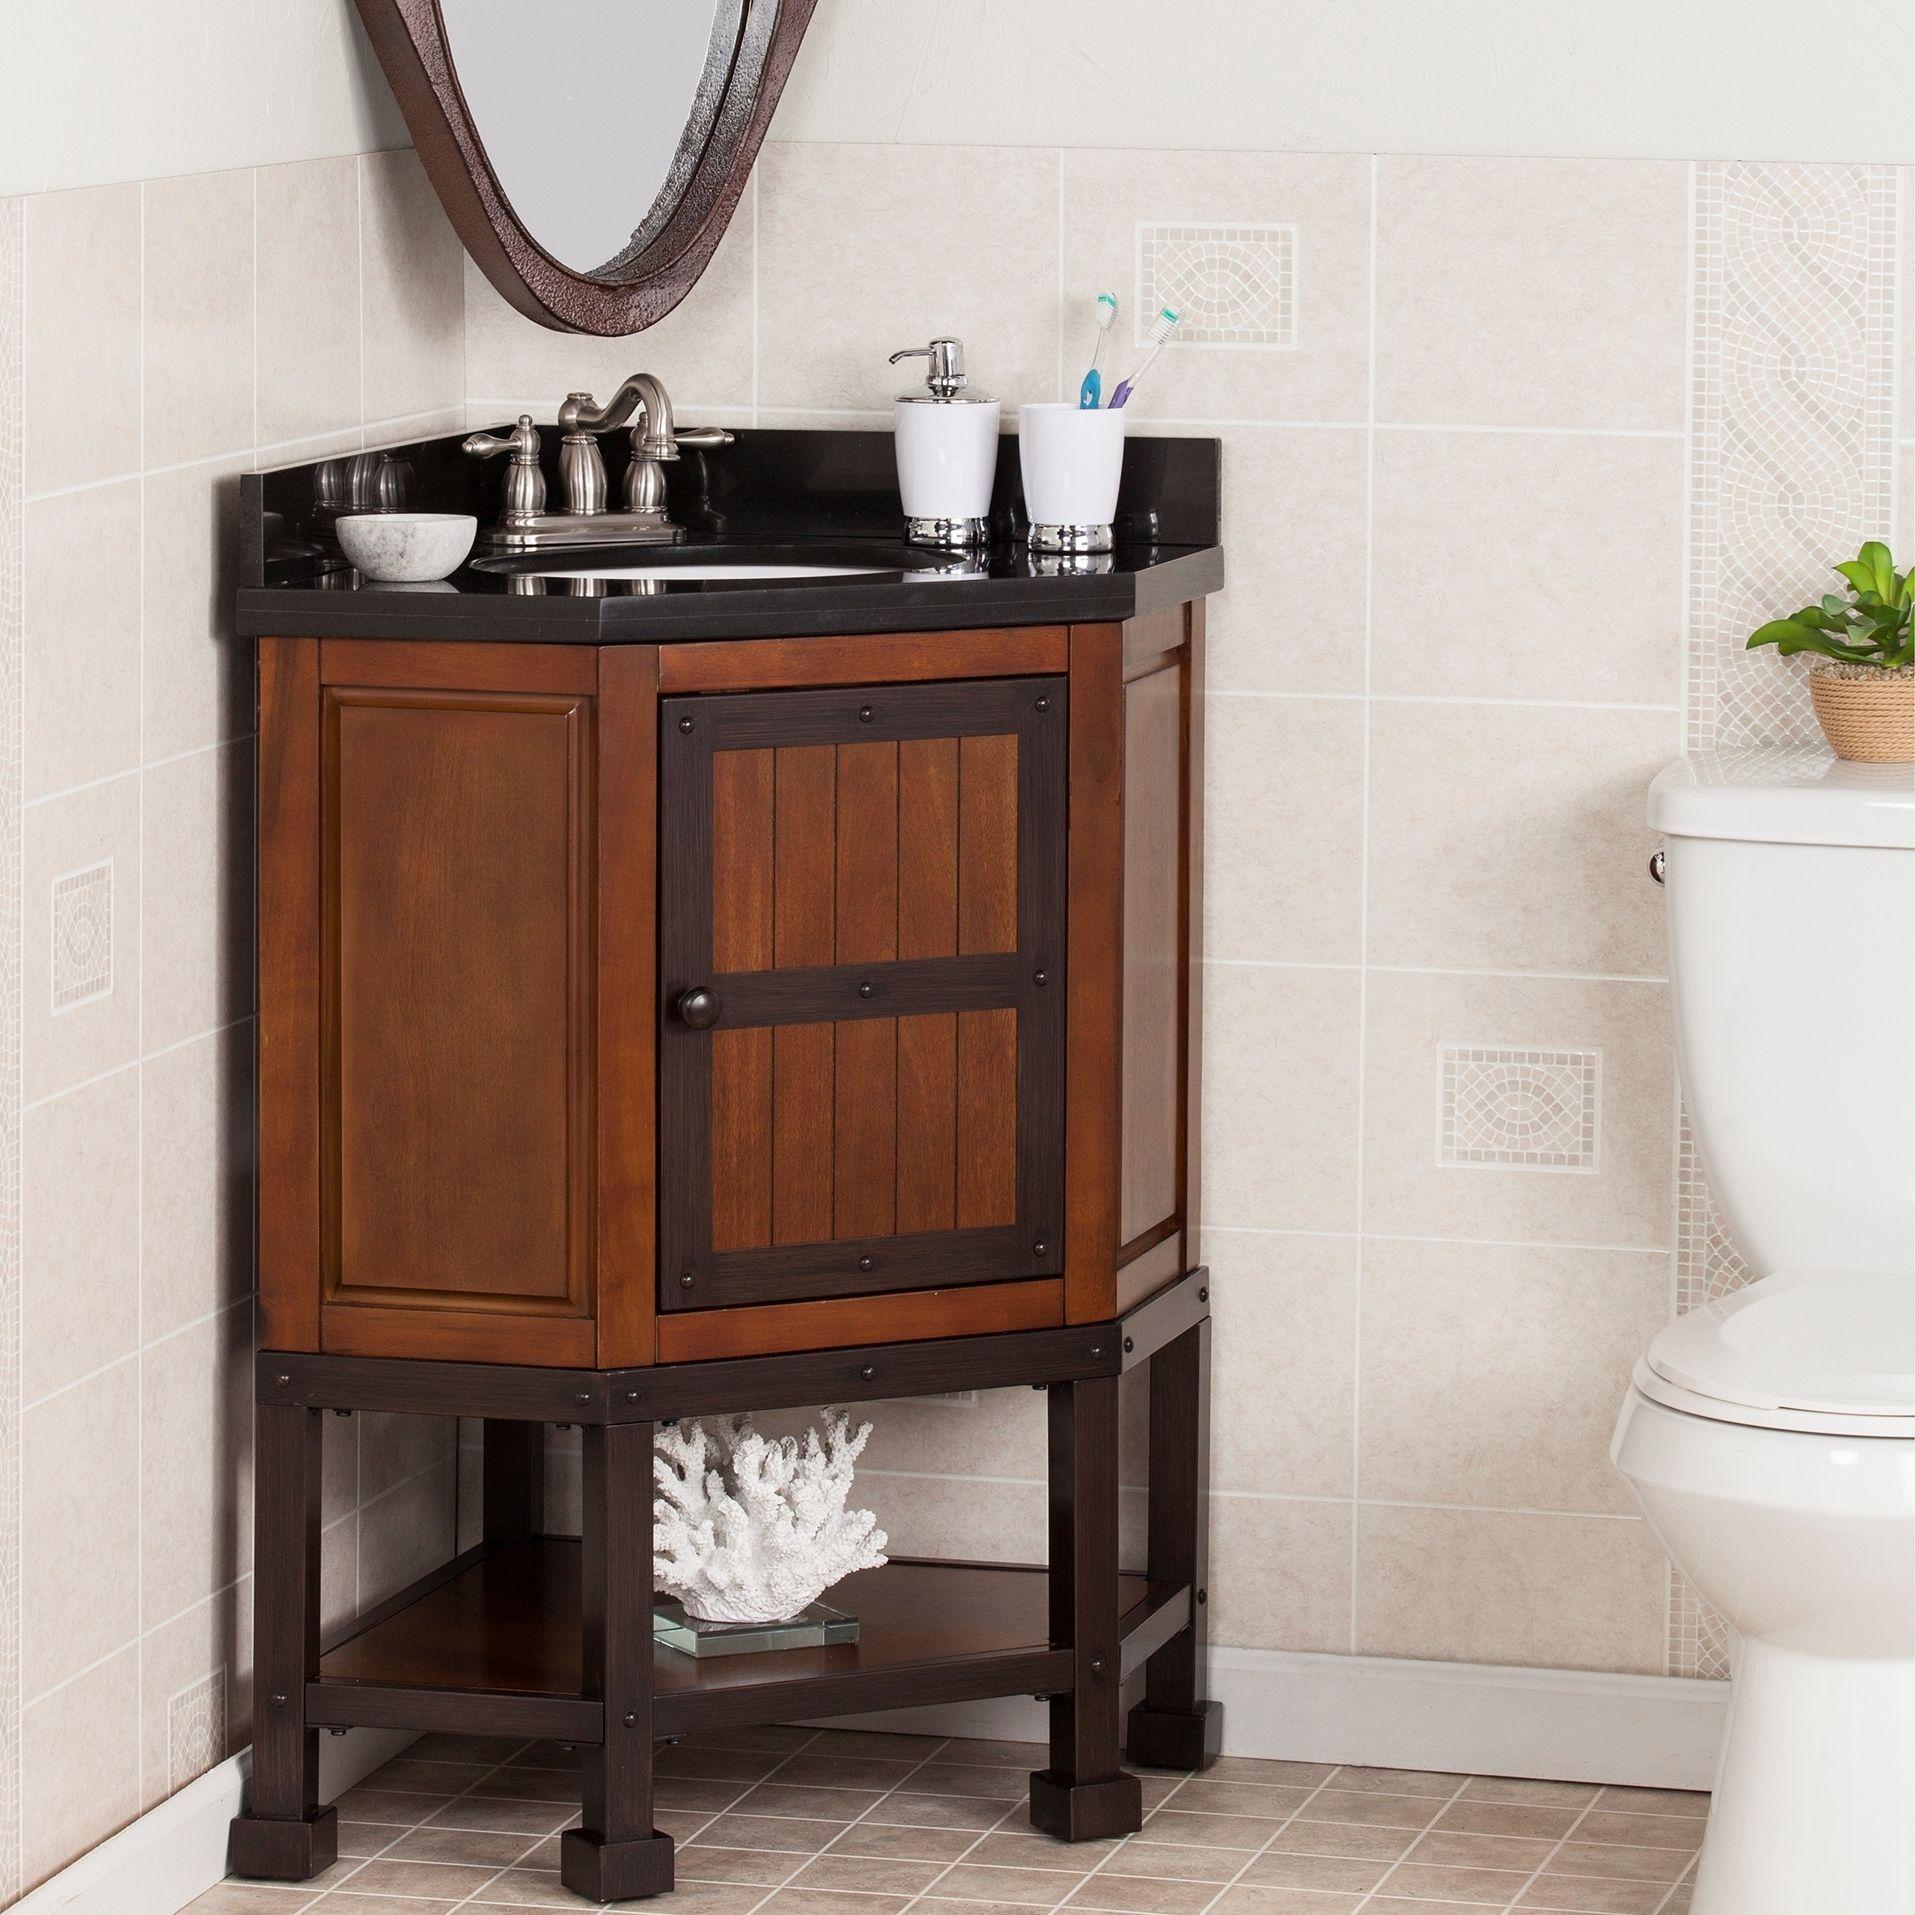 Harpers Square Apartments: Harper Blvd Edgerton Granite Top Corner Bath Vanity Sink